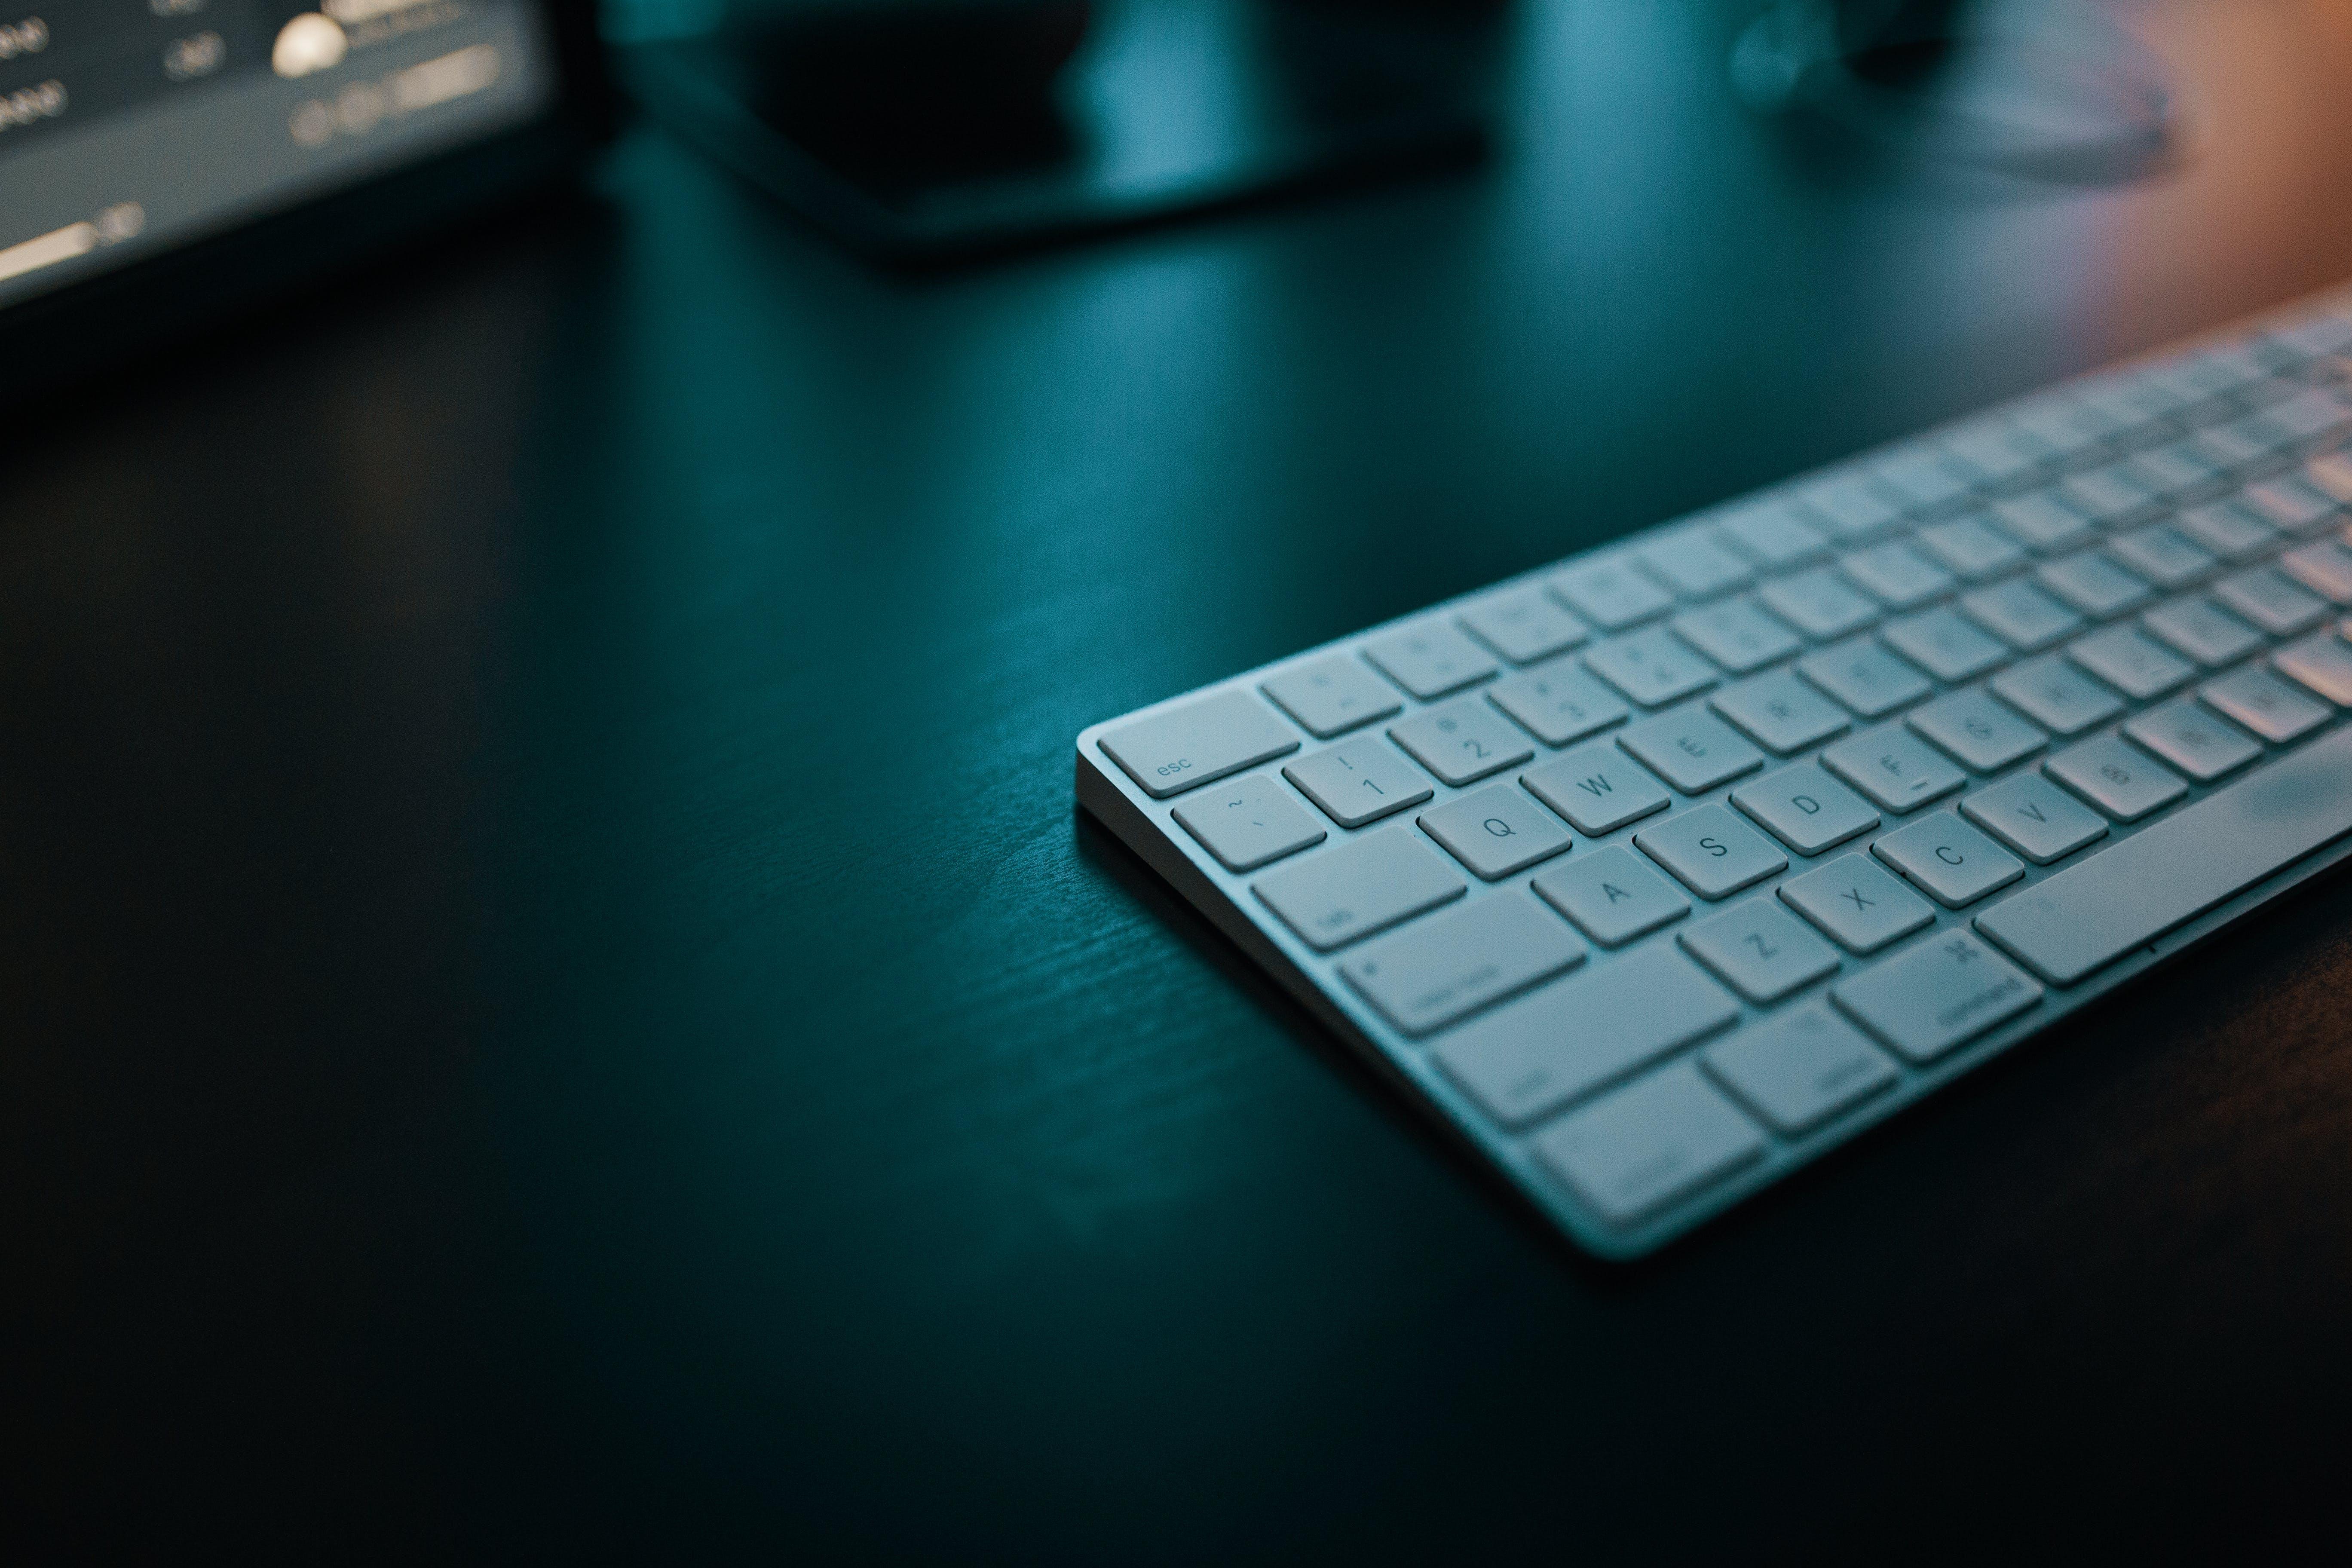 Depth Photography Of Apple Magic Keyboard